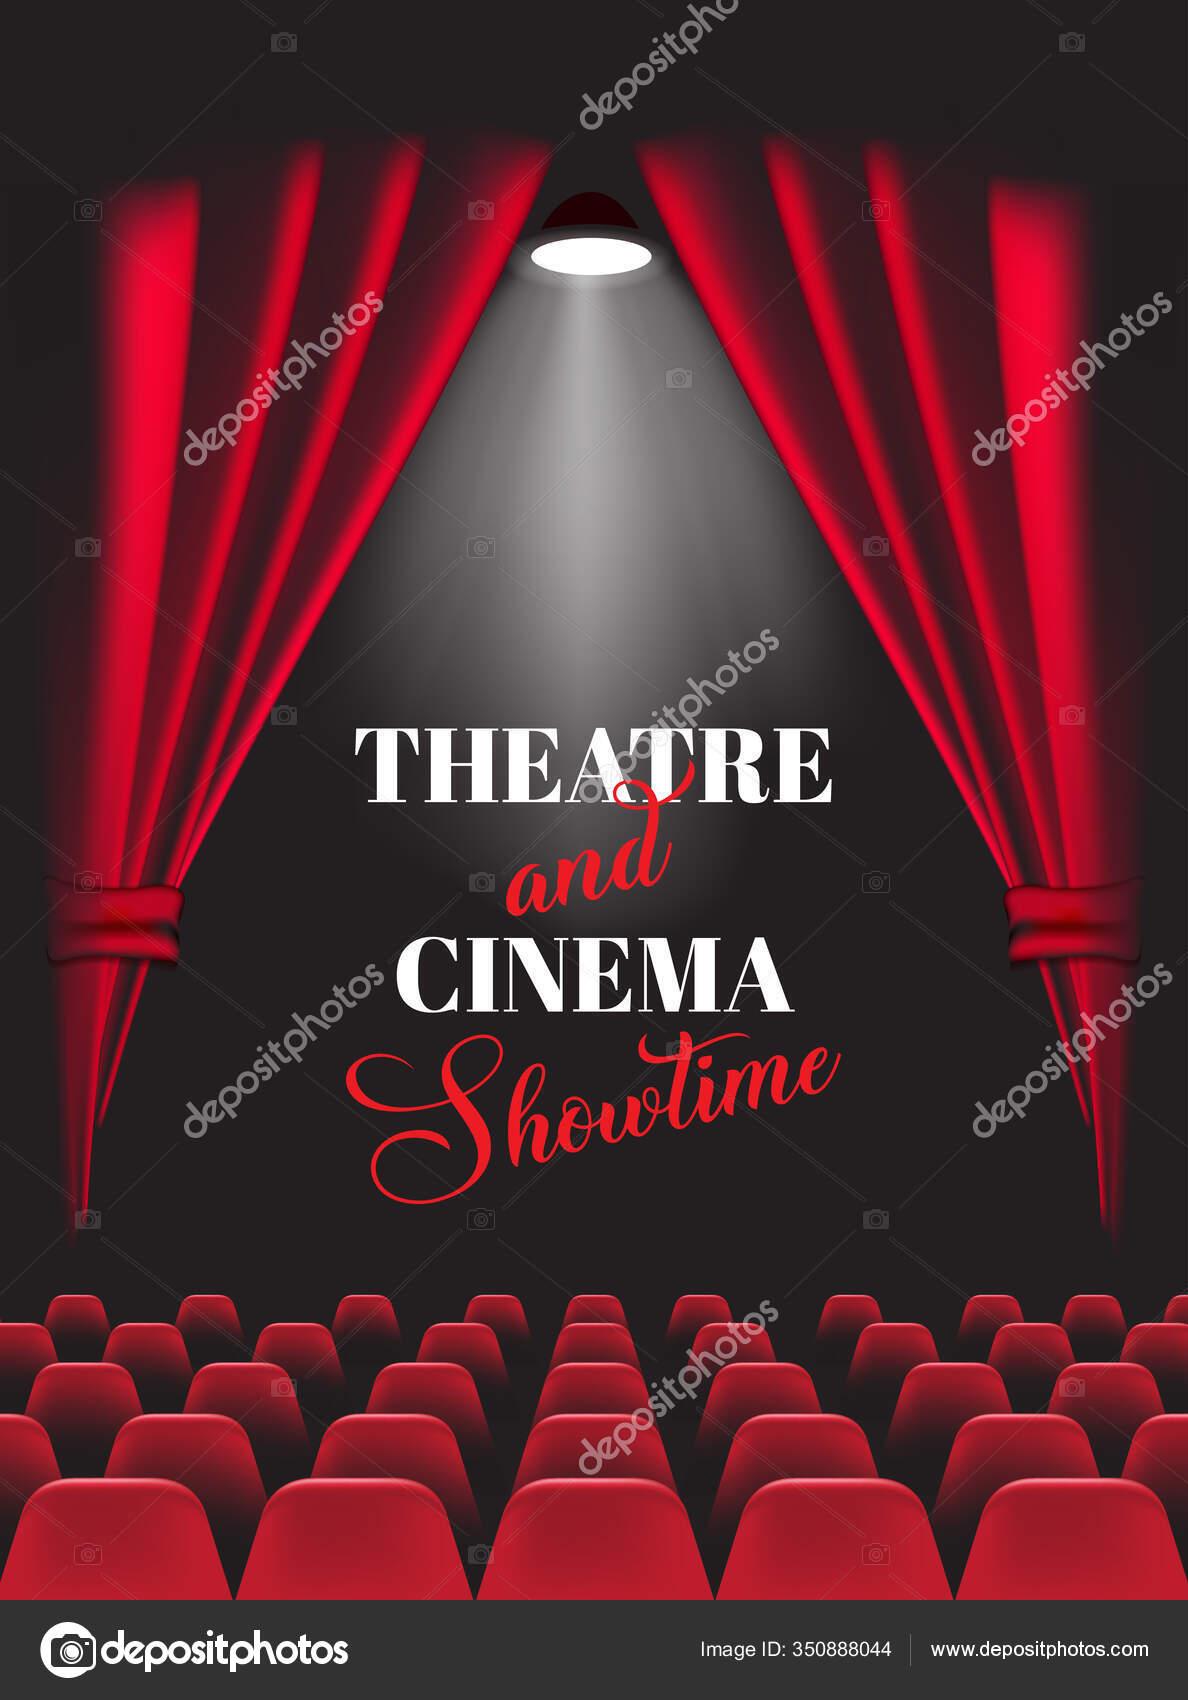 Latar Belakang Teater : latar, belakang, teater, Latar, Belakang, Dengan, Tirai, Teater, Merah, Ilustrasi, Vektor, Saliyeri, #350888044